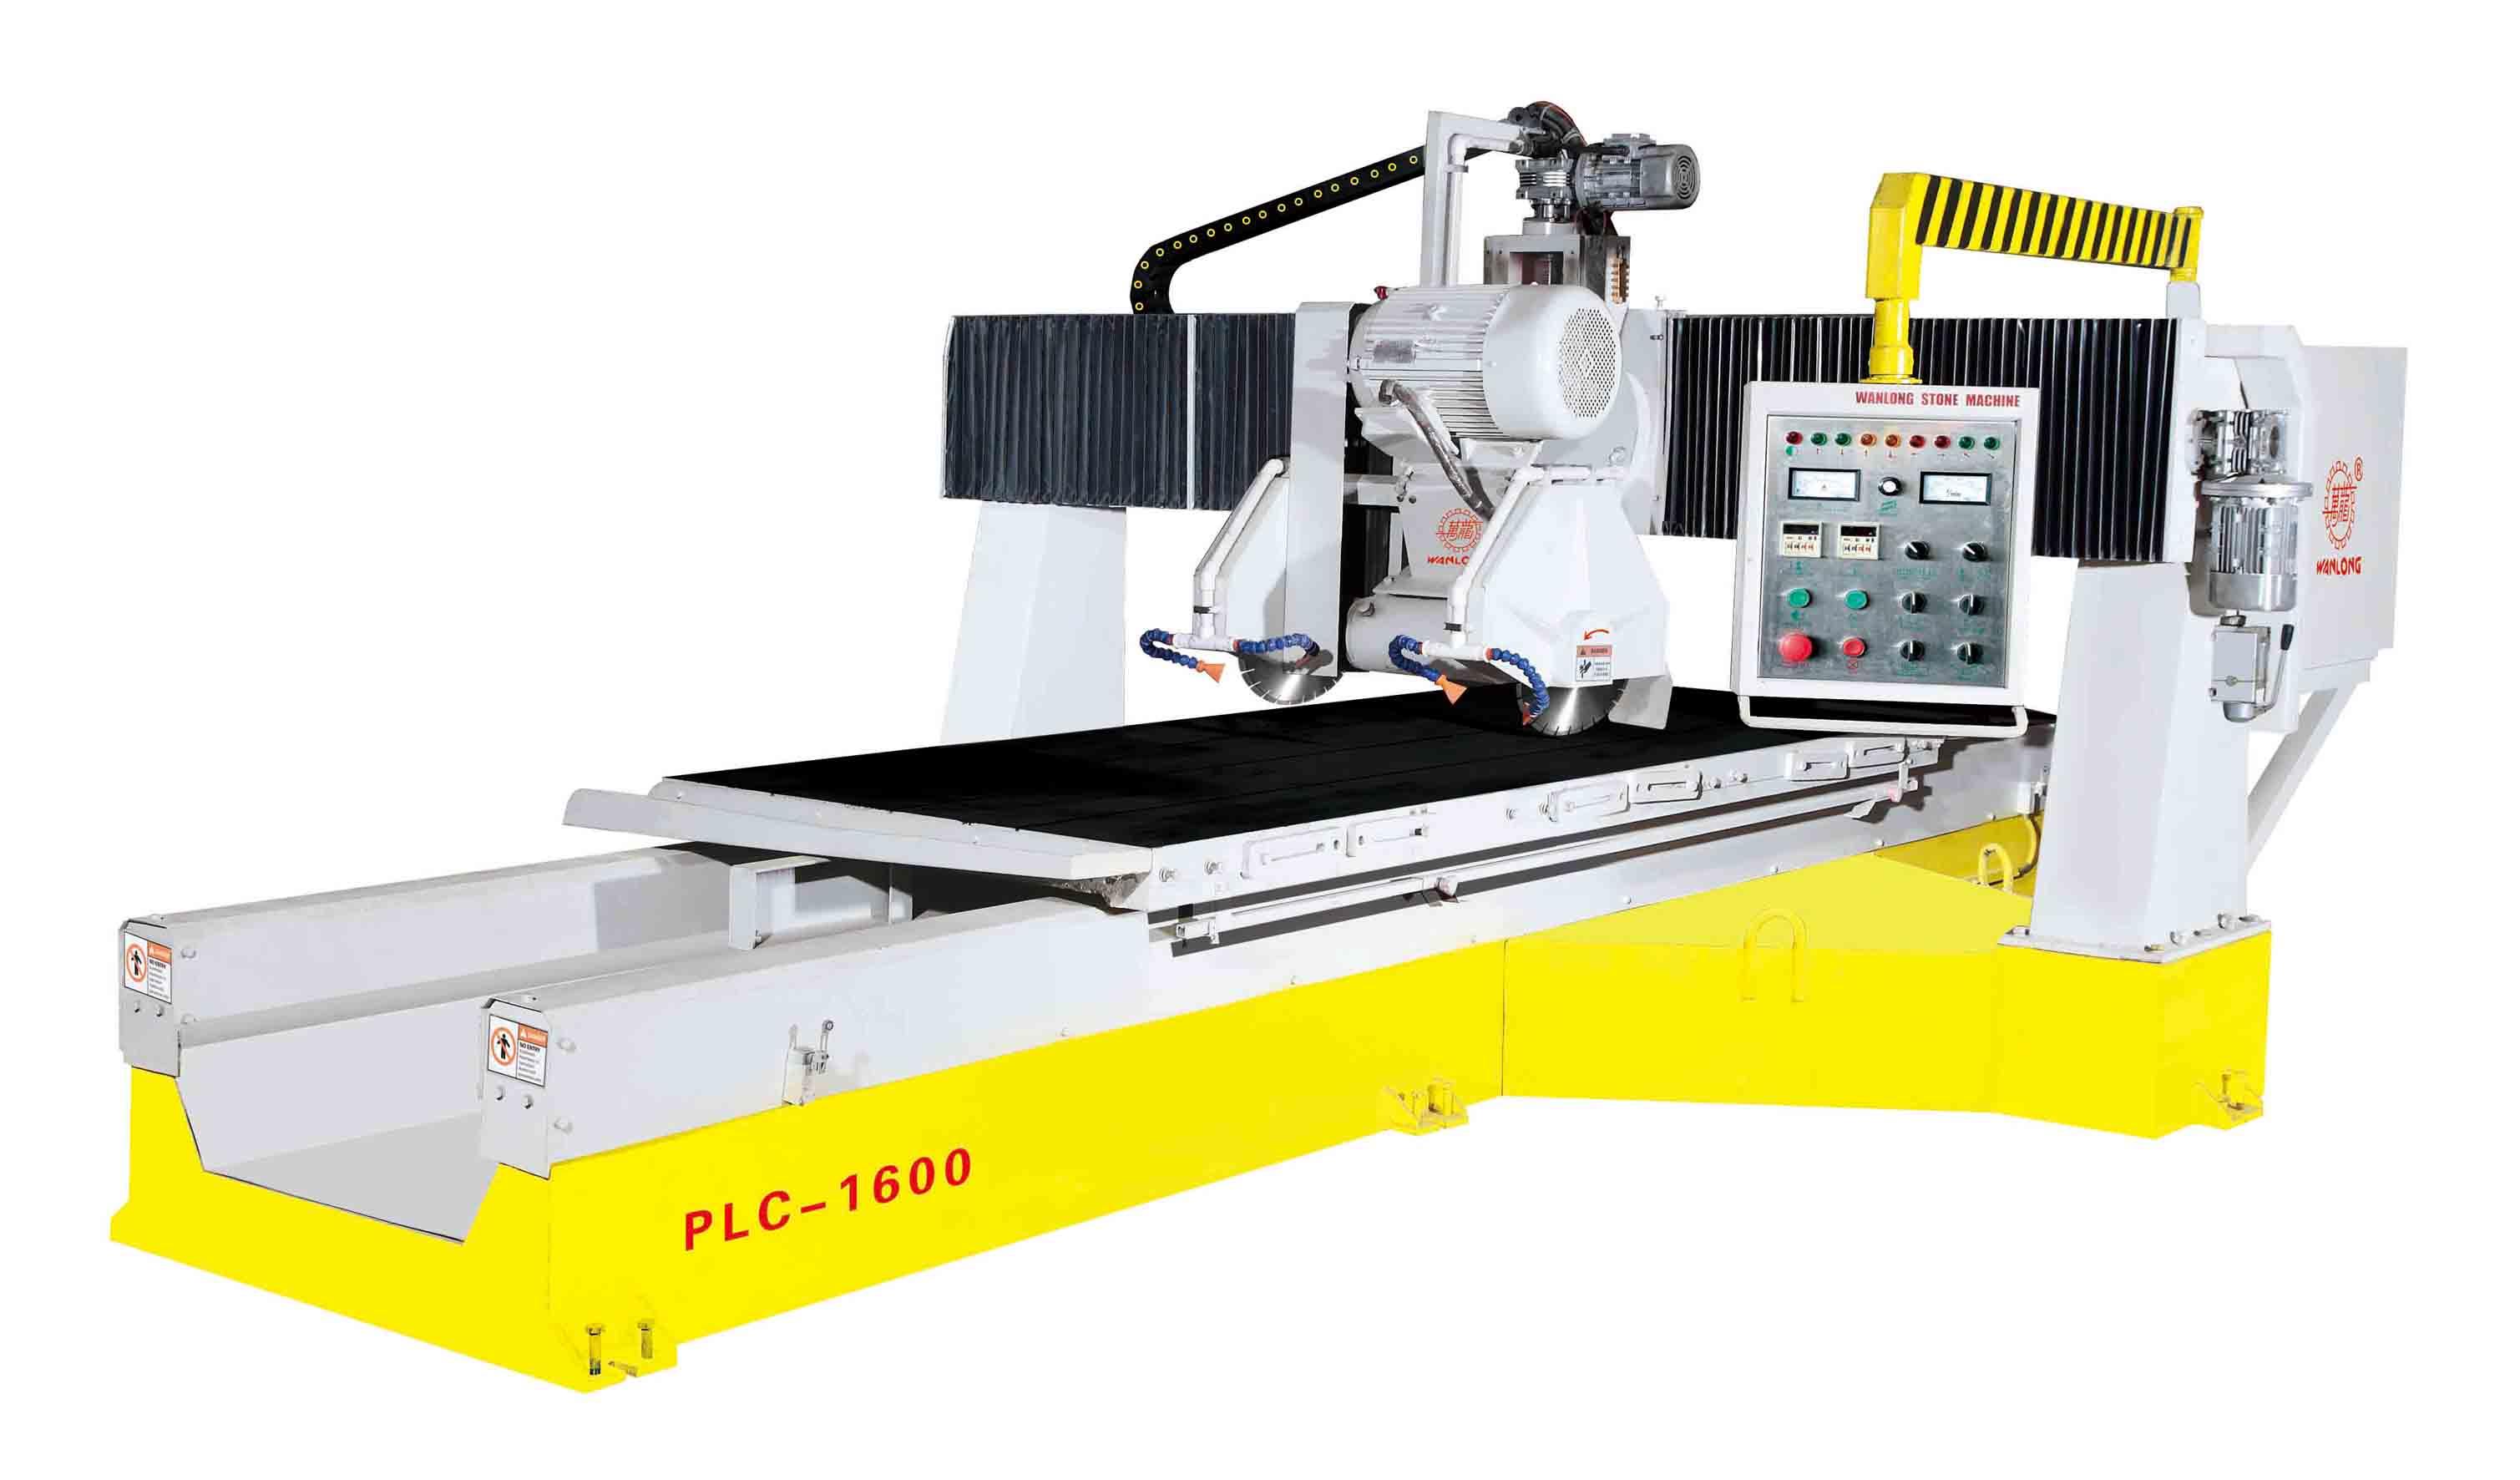 PLC-1600 Bridge Profile Machine